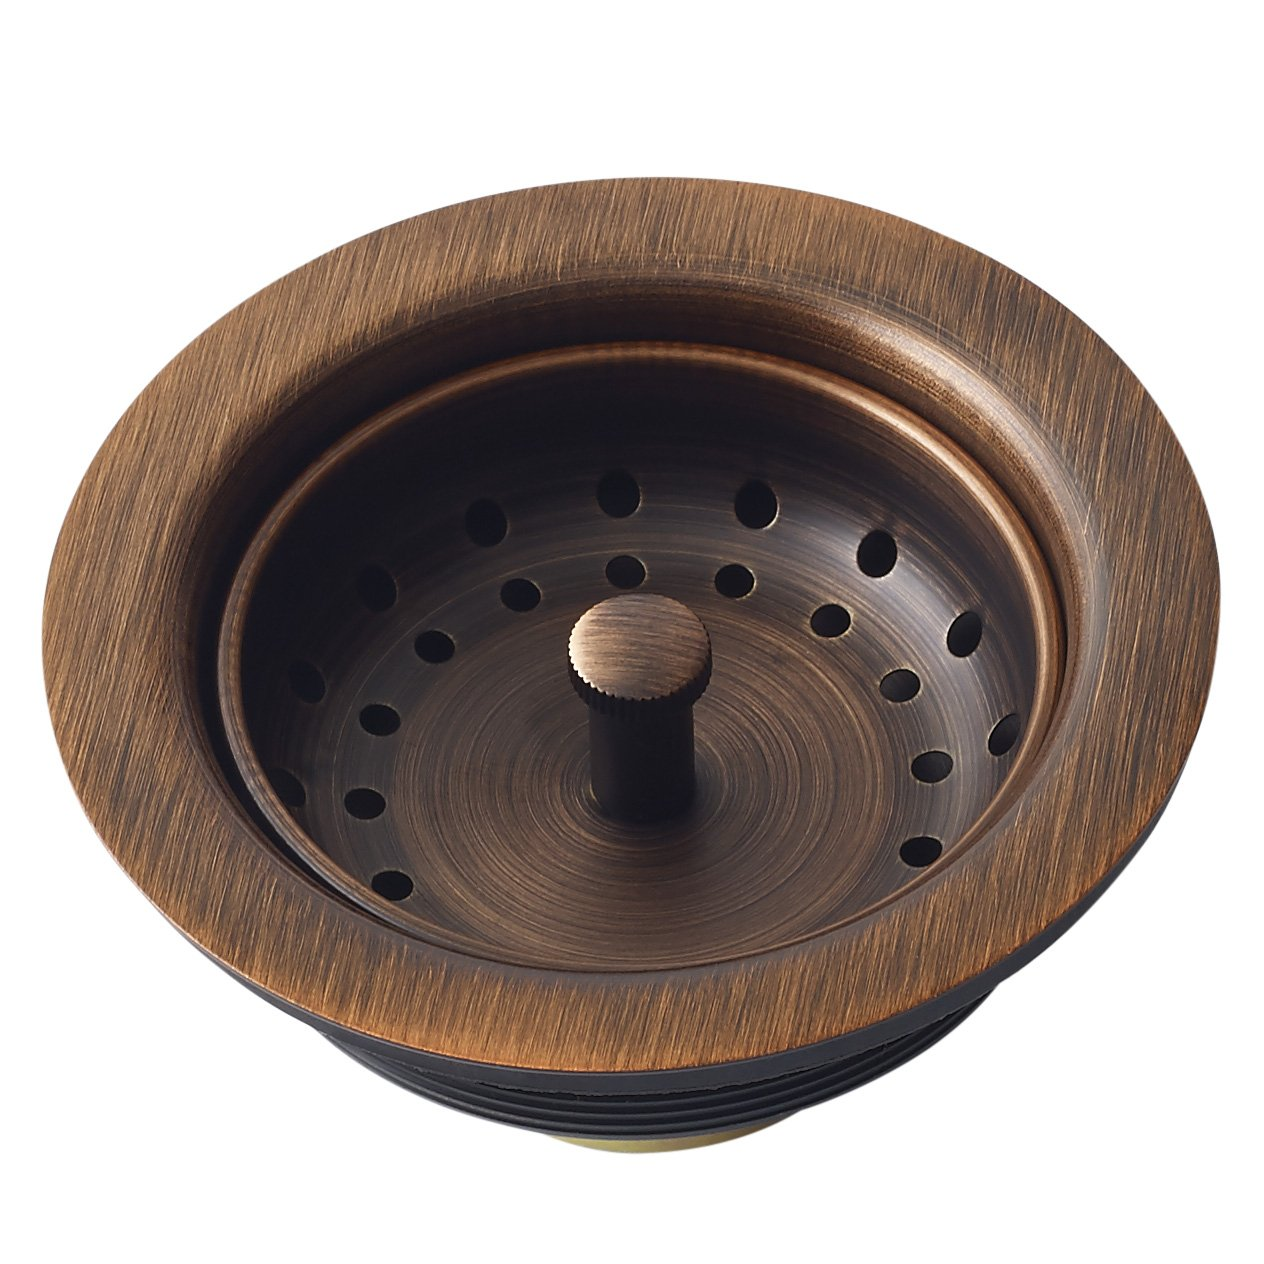 Sinkology Kitchen Sink Basket Strainer Drain TB35-01 by Sinkology